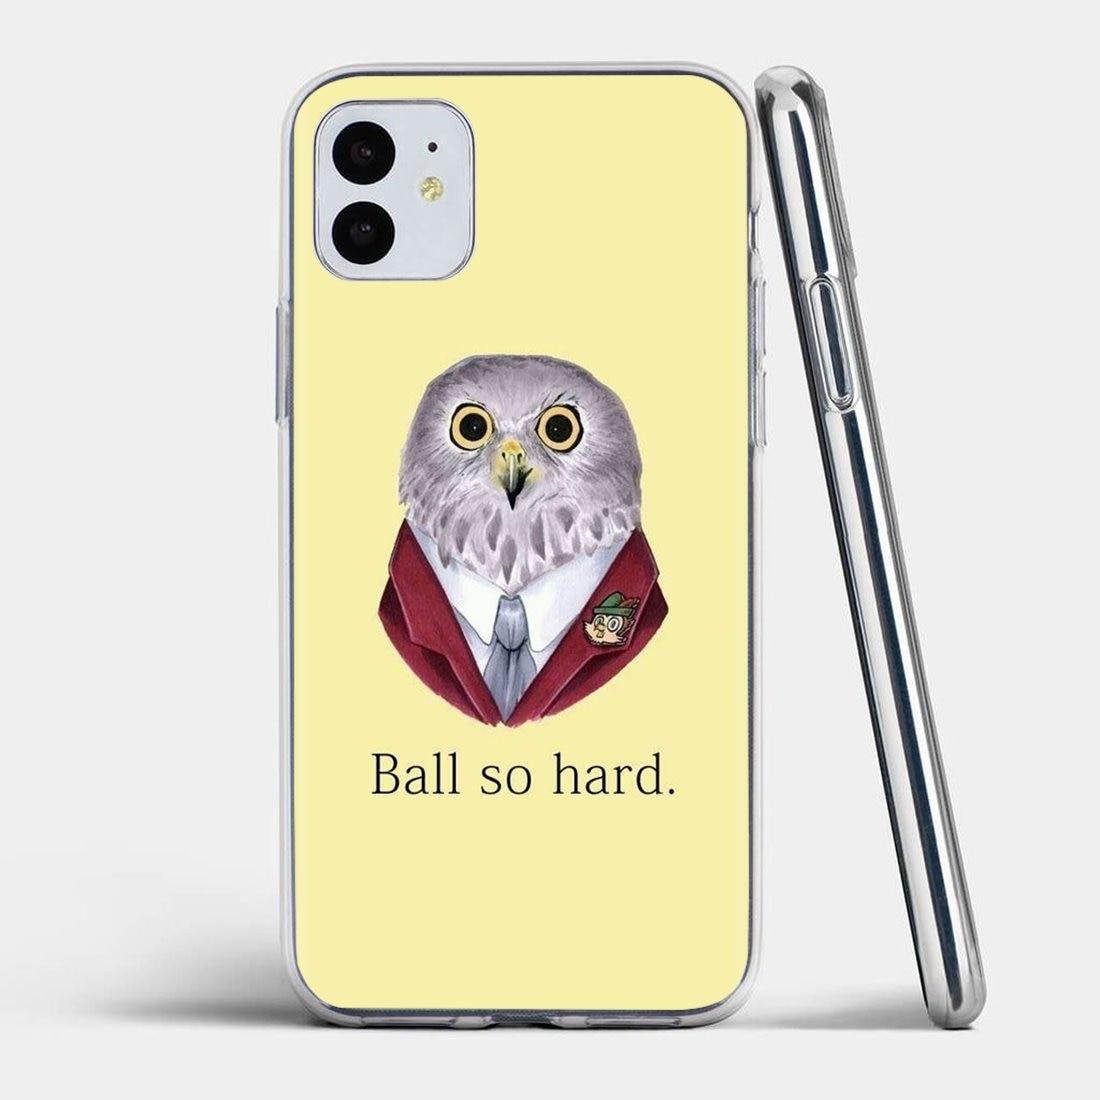 Wallpaper Owl Loving Silicone Phone Case For Samsung Galaxy A10 A30 A40 A50 A60 A70 S6